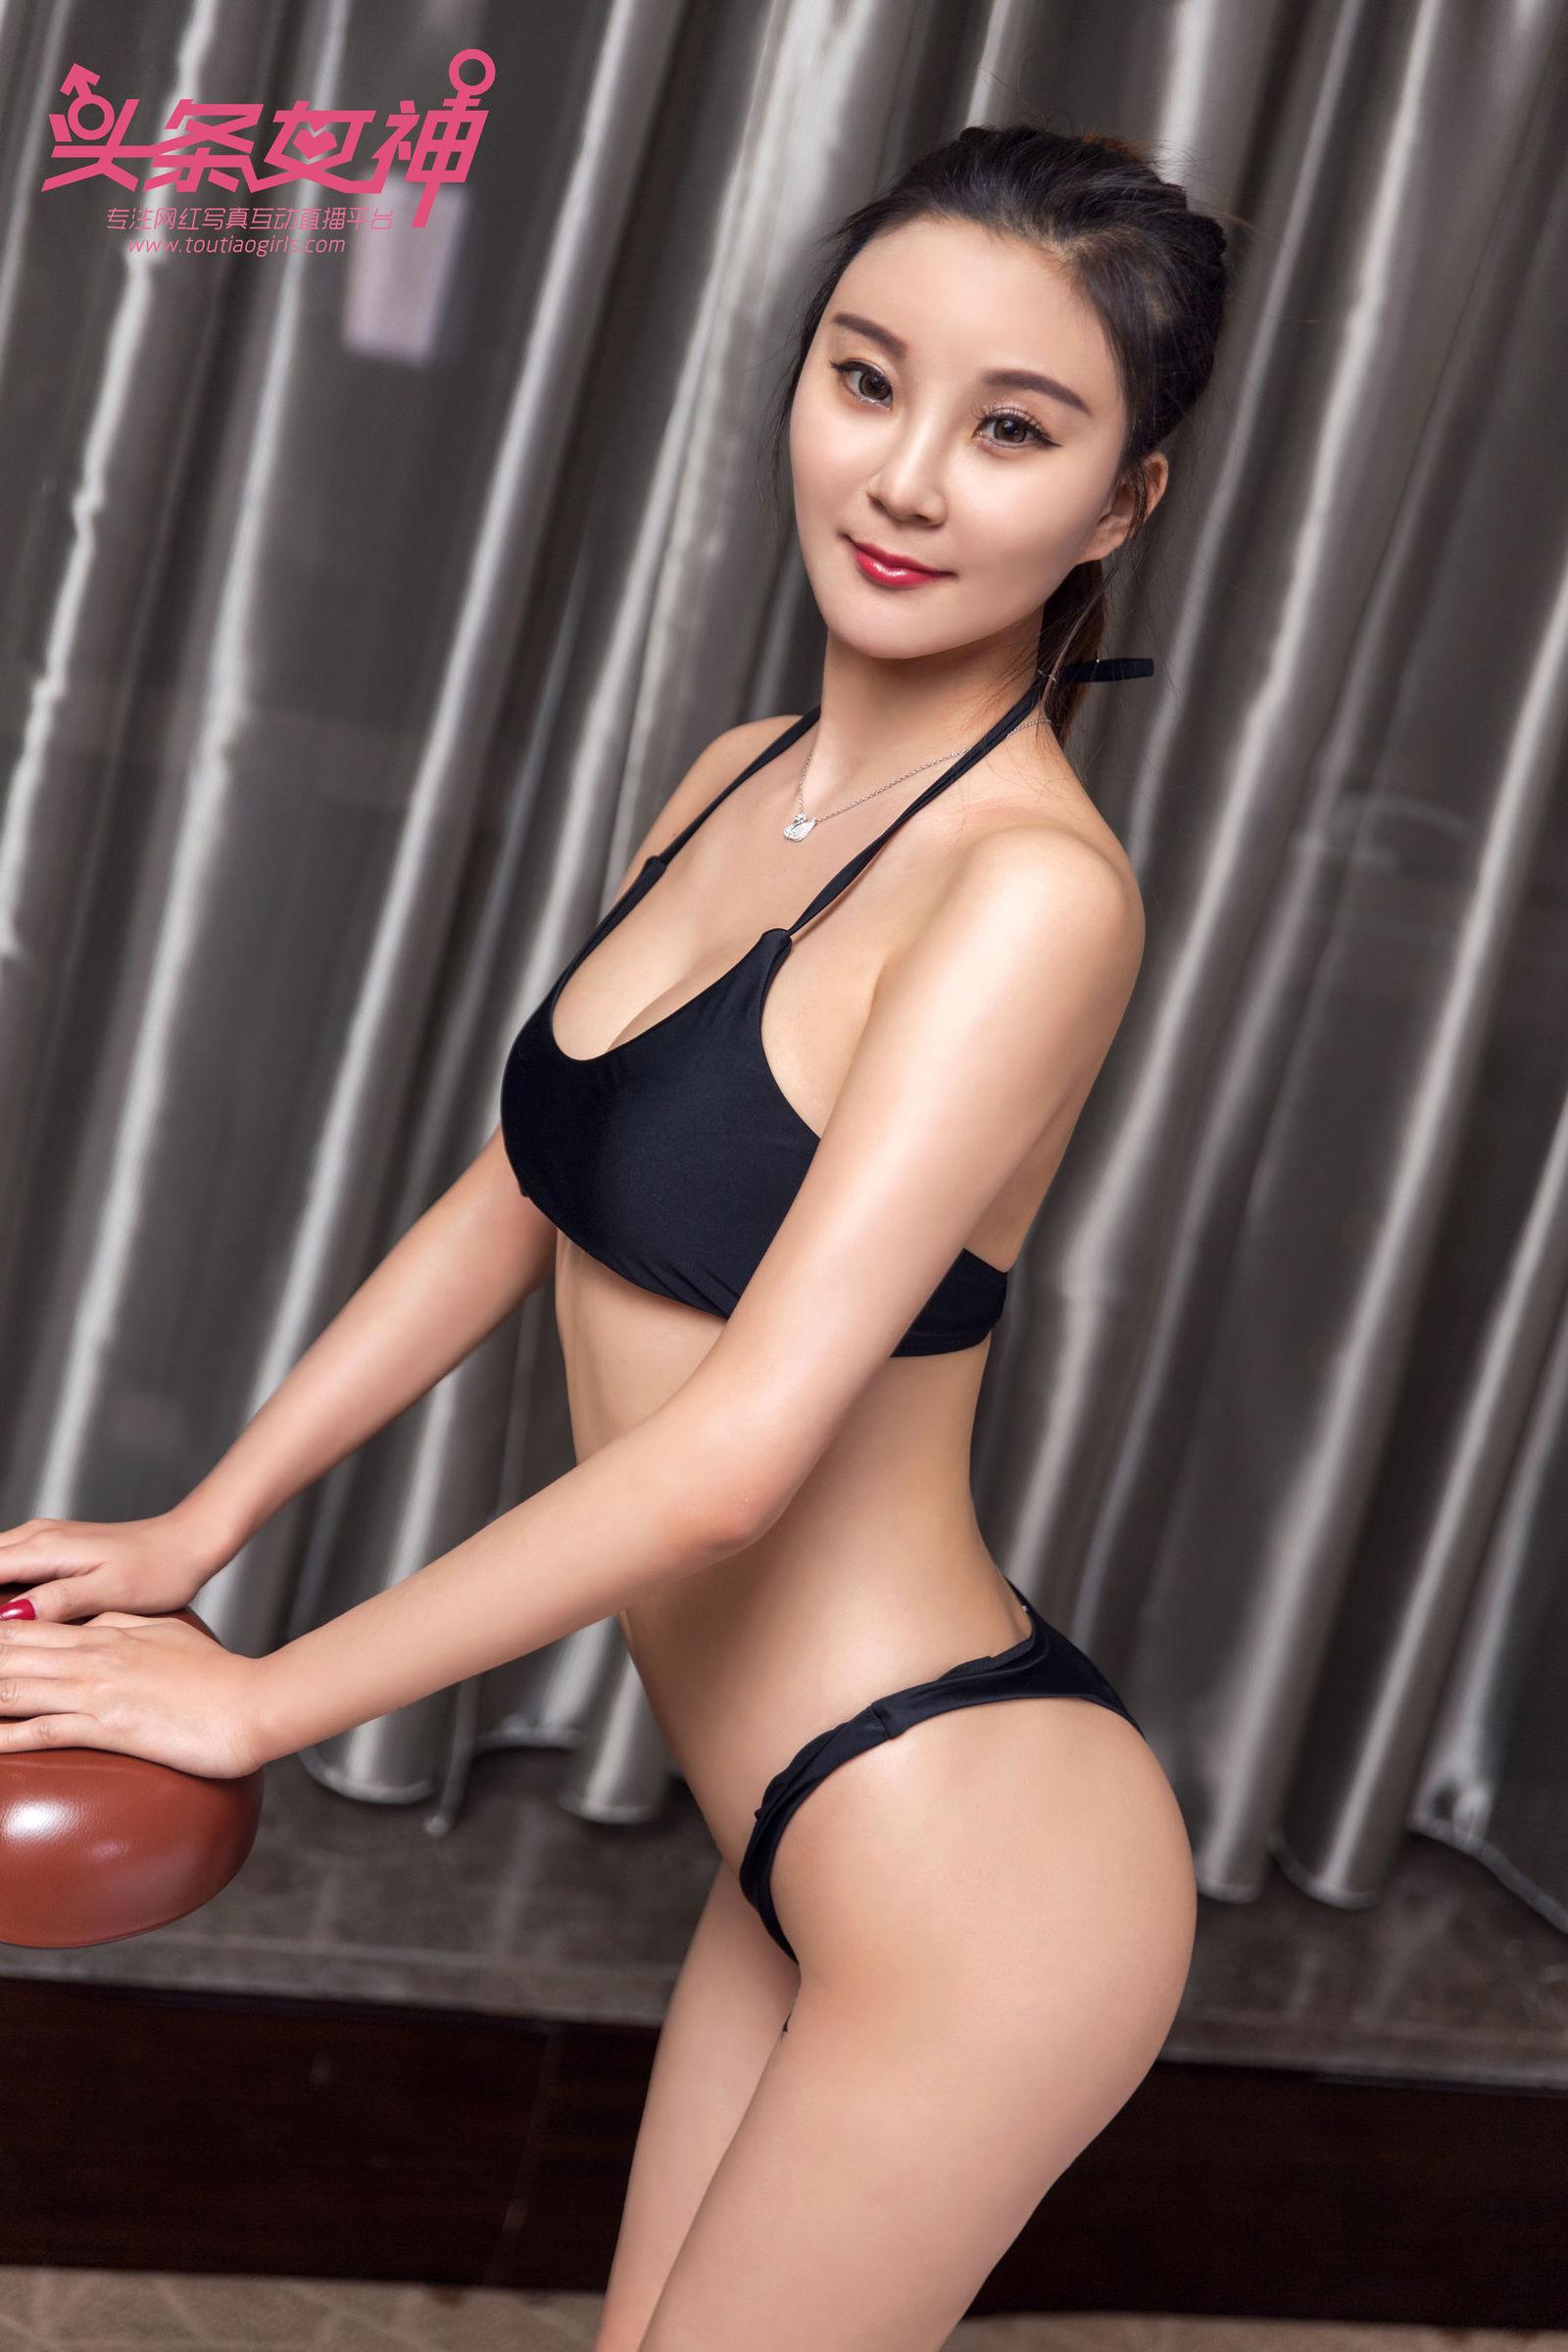 [Toutiaogirls头条女神] 琳琳 - 甜心运动 丝袜美图[18P]